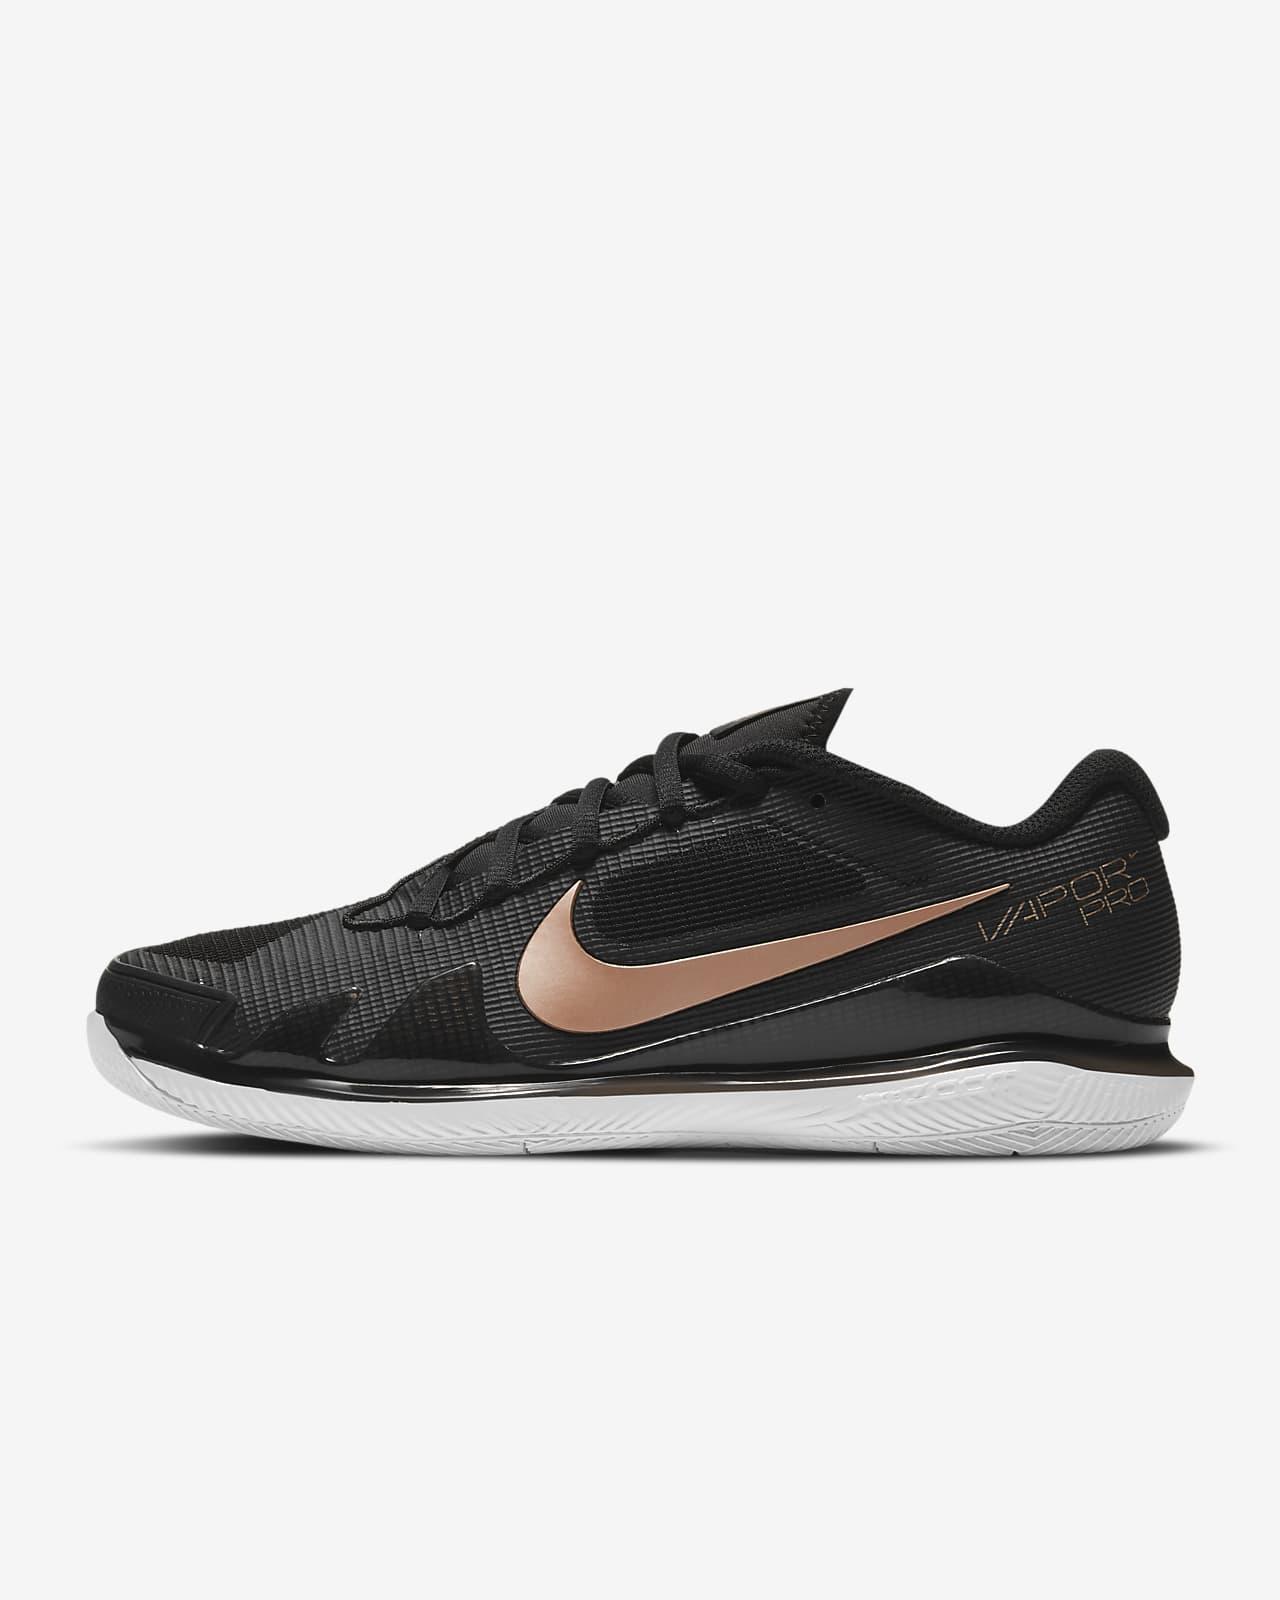 NikeCourt Air Zoom Vapor Pro Women's Hard-Court Tennis Shoe